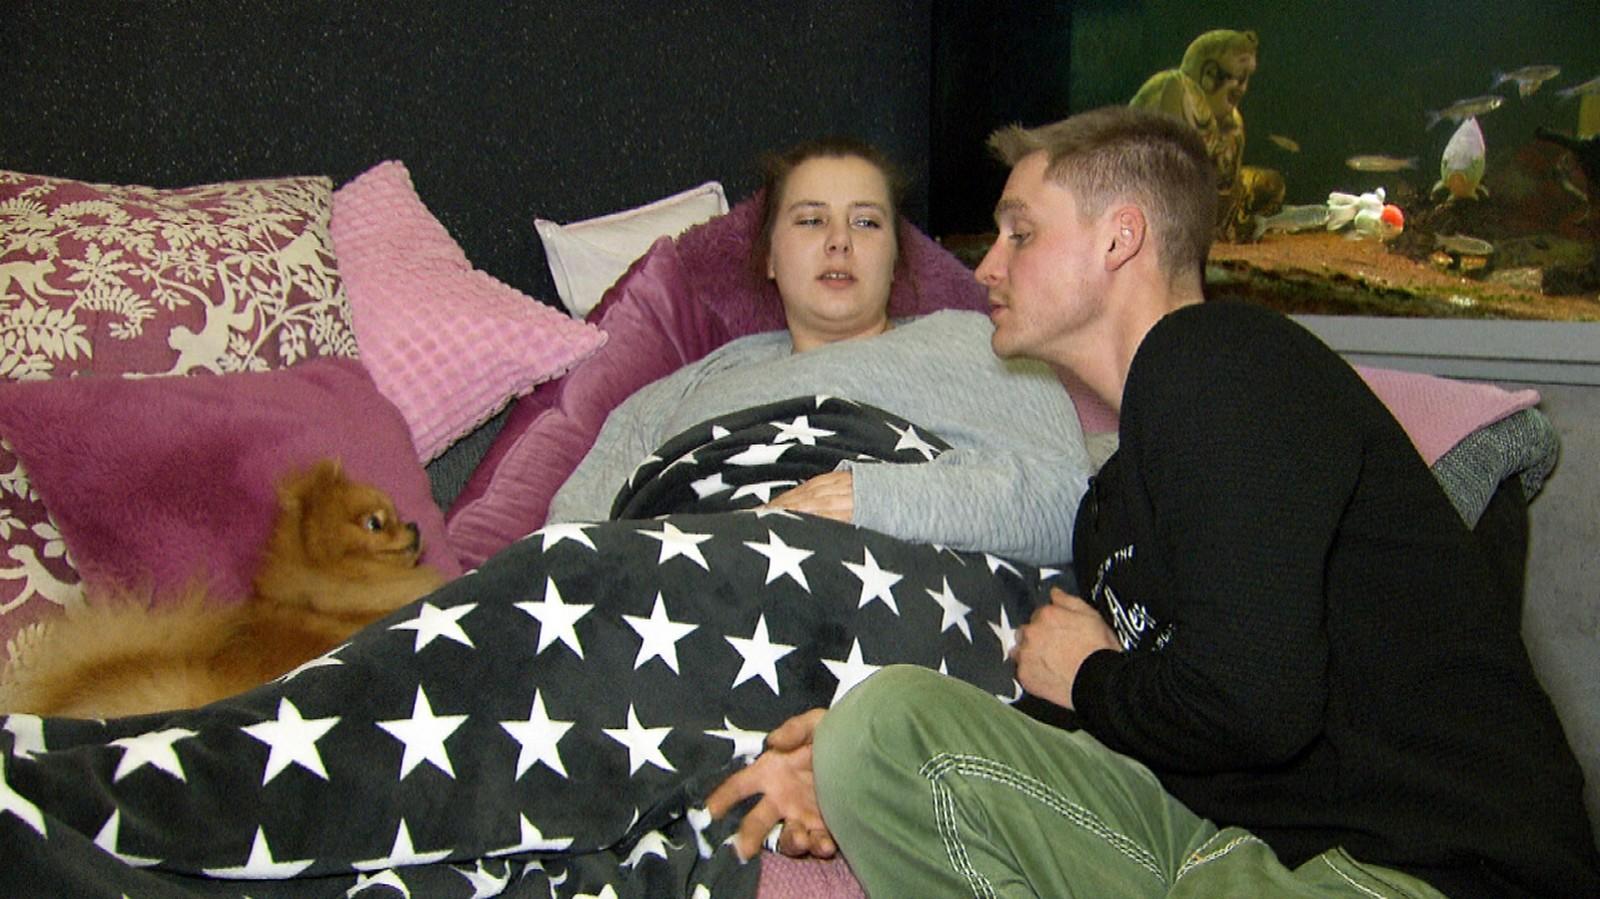 Sarafiuna Wollny und Peter